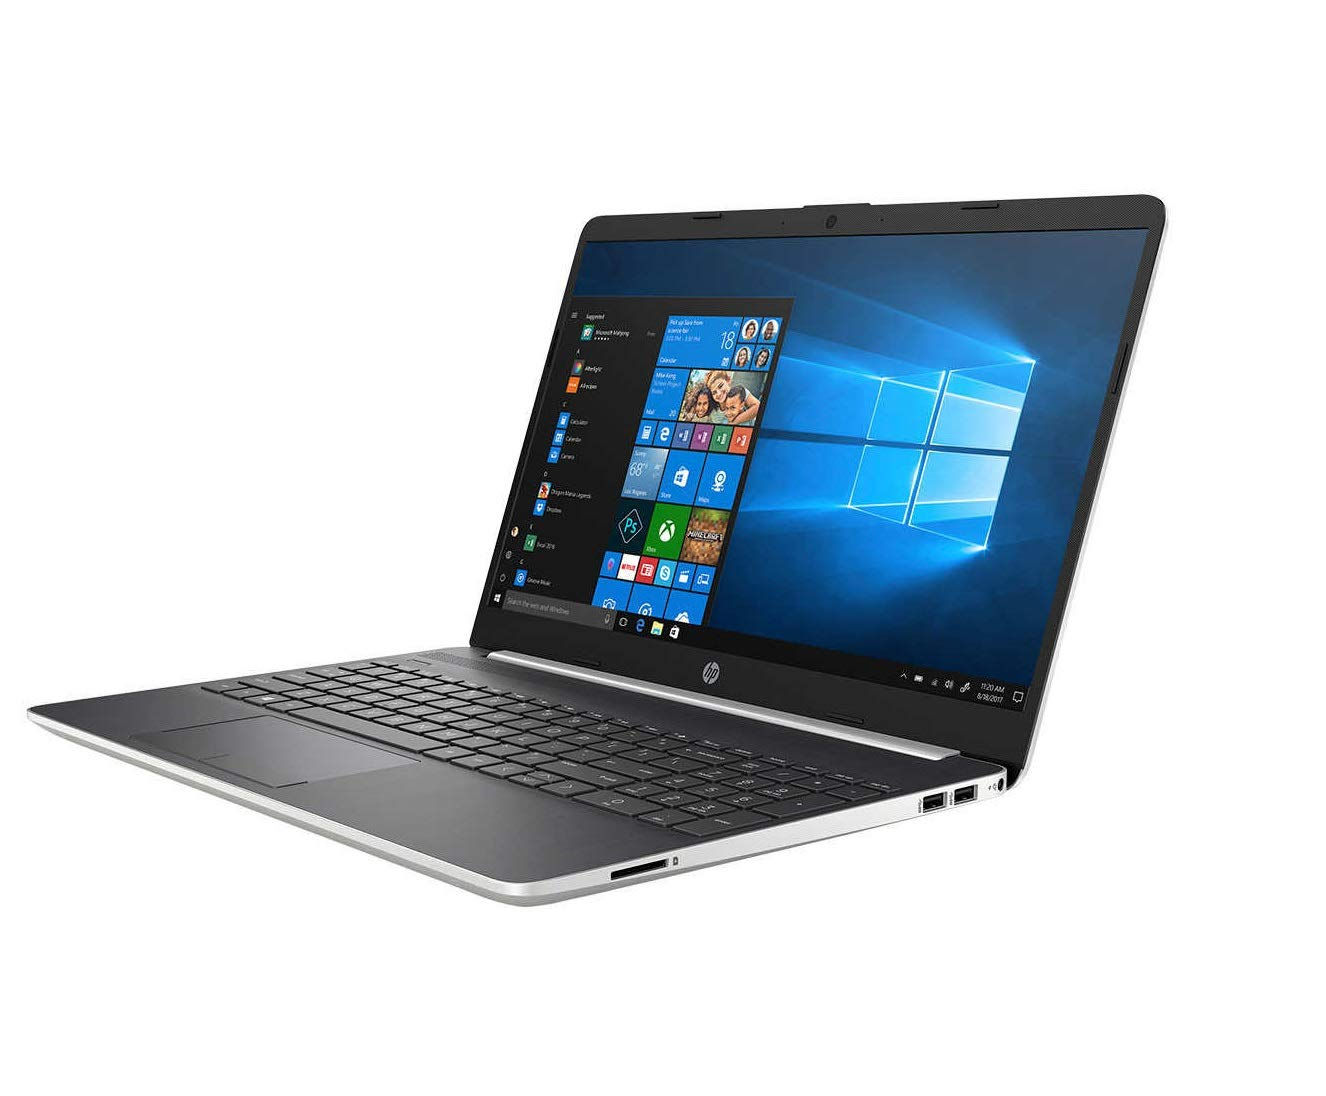 "HP 15-dw0035cl Home Office Laptop Silver (Intel i7-8565U 4-Core, 16GB RAM, 2TB PCIe SSD, 15.6"" Touch HD (1366x768), Intel UHD 620, WiFi, Bluetooth, Webcam, 2xUSB 3.1, 1xHDMI, SD Card, Win 10 Pro)"